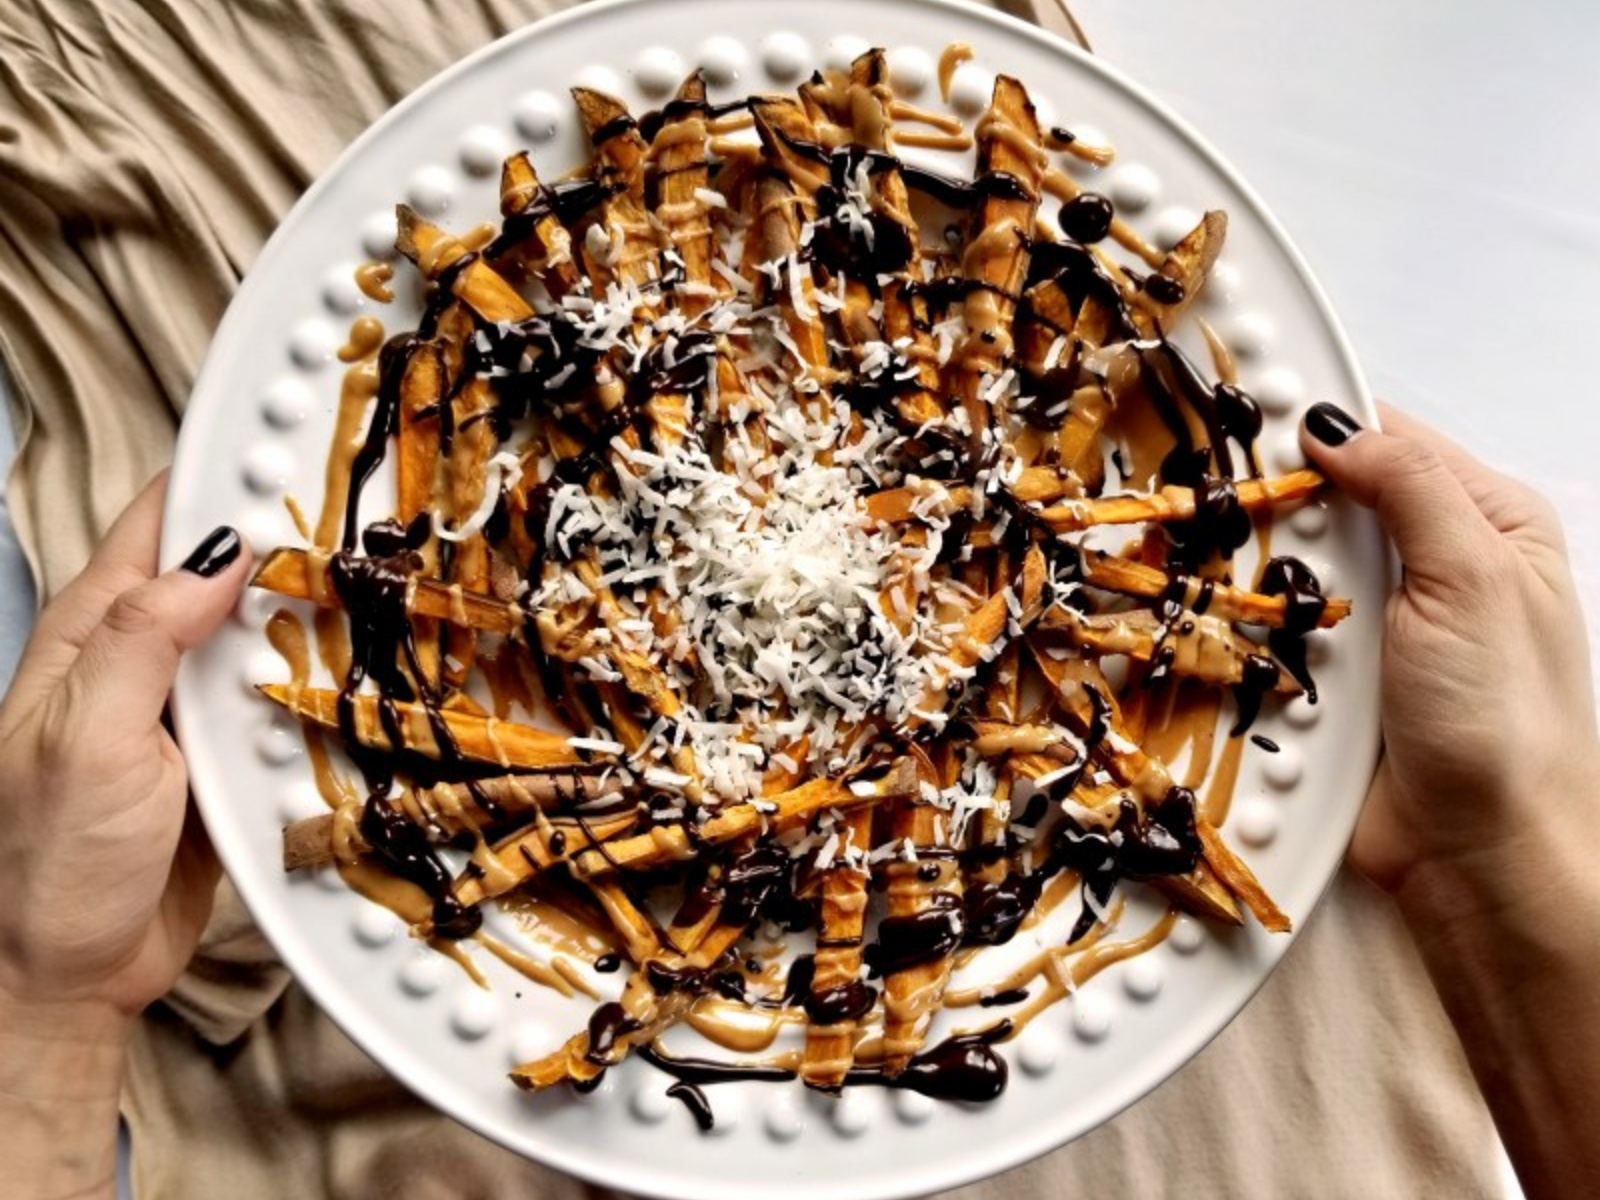 Vegan Dessert Sweet Potato Fries